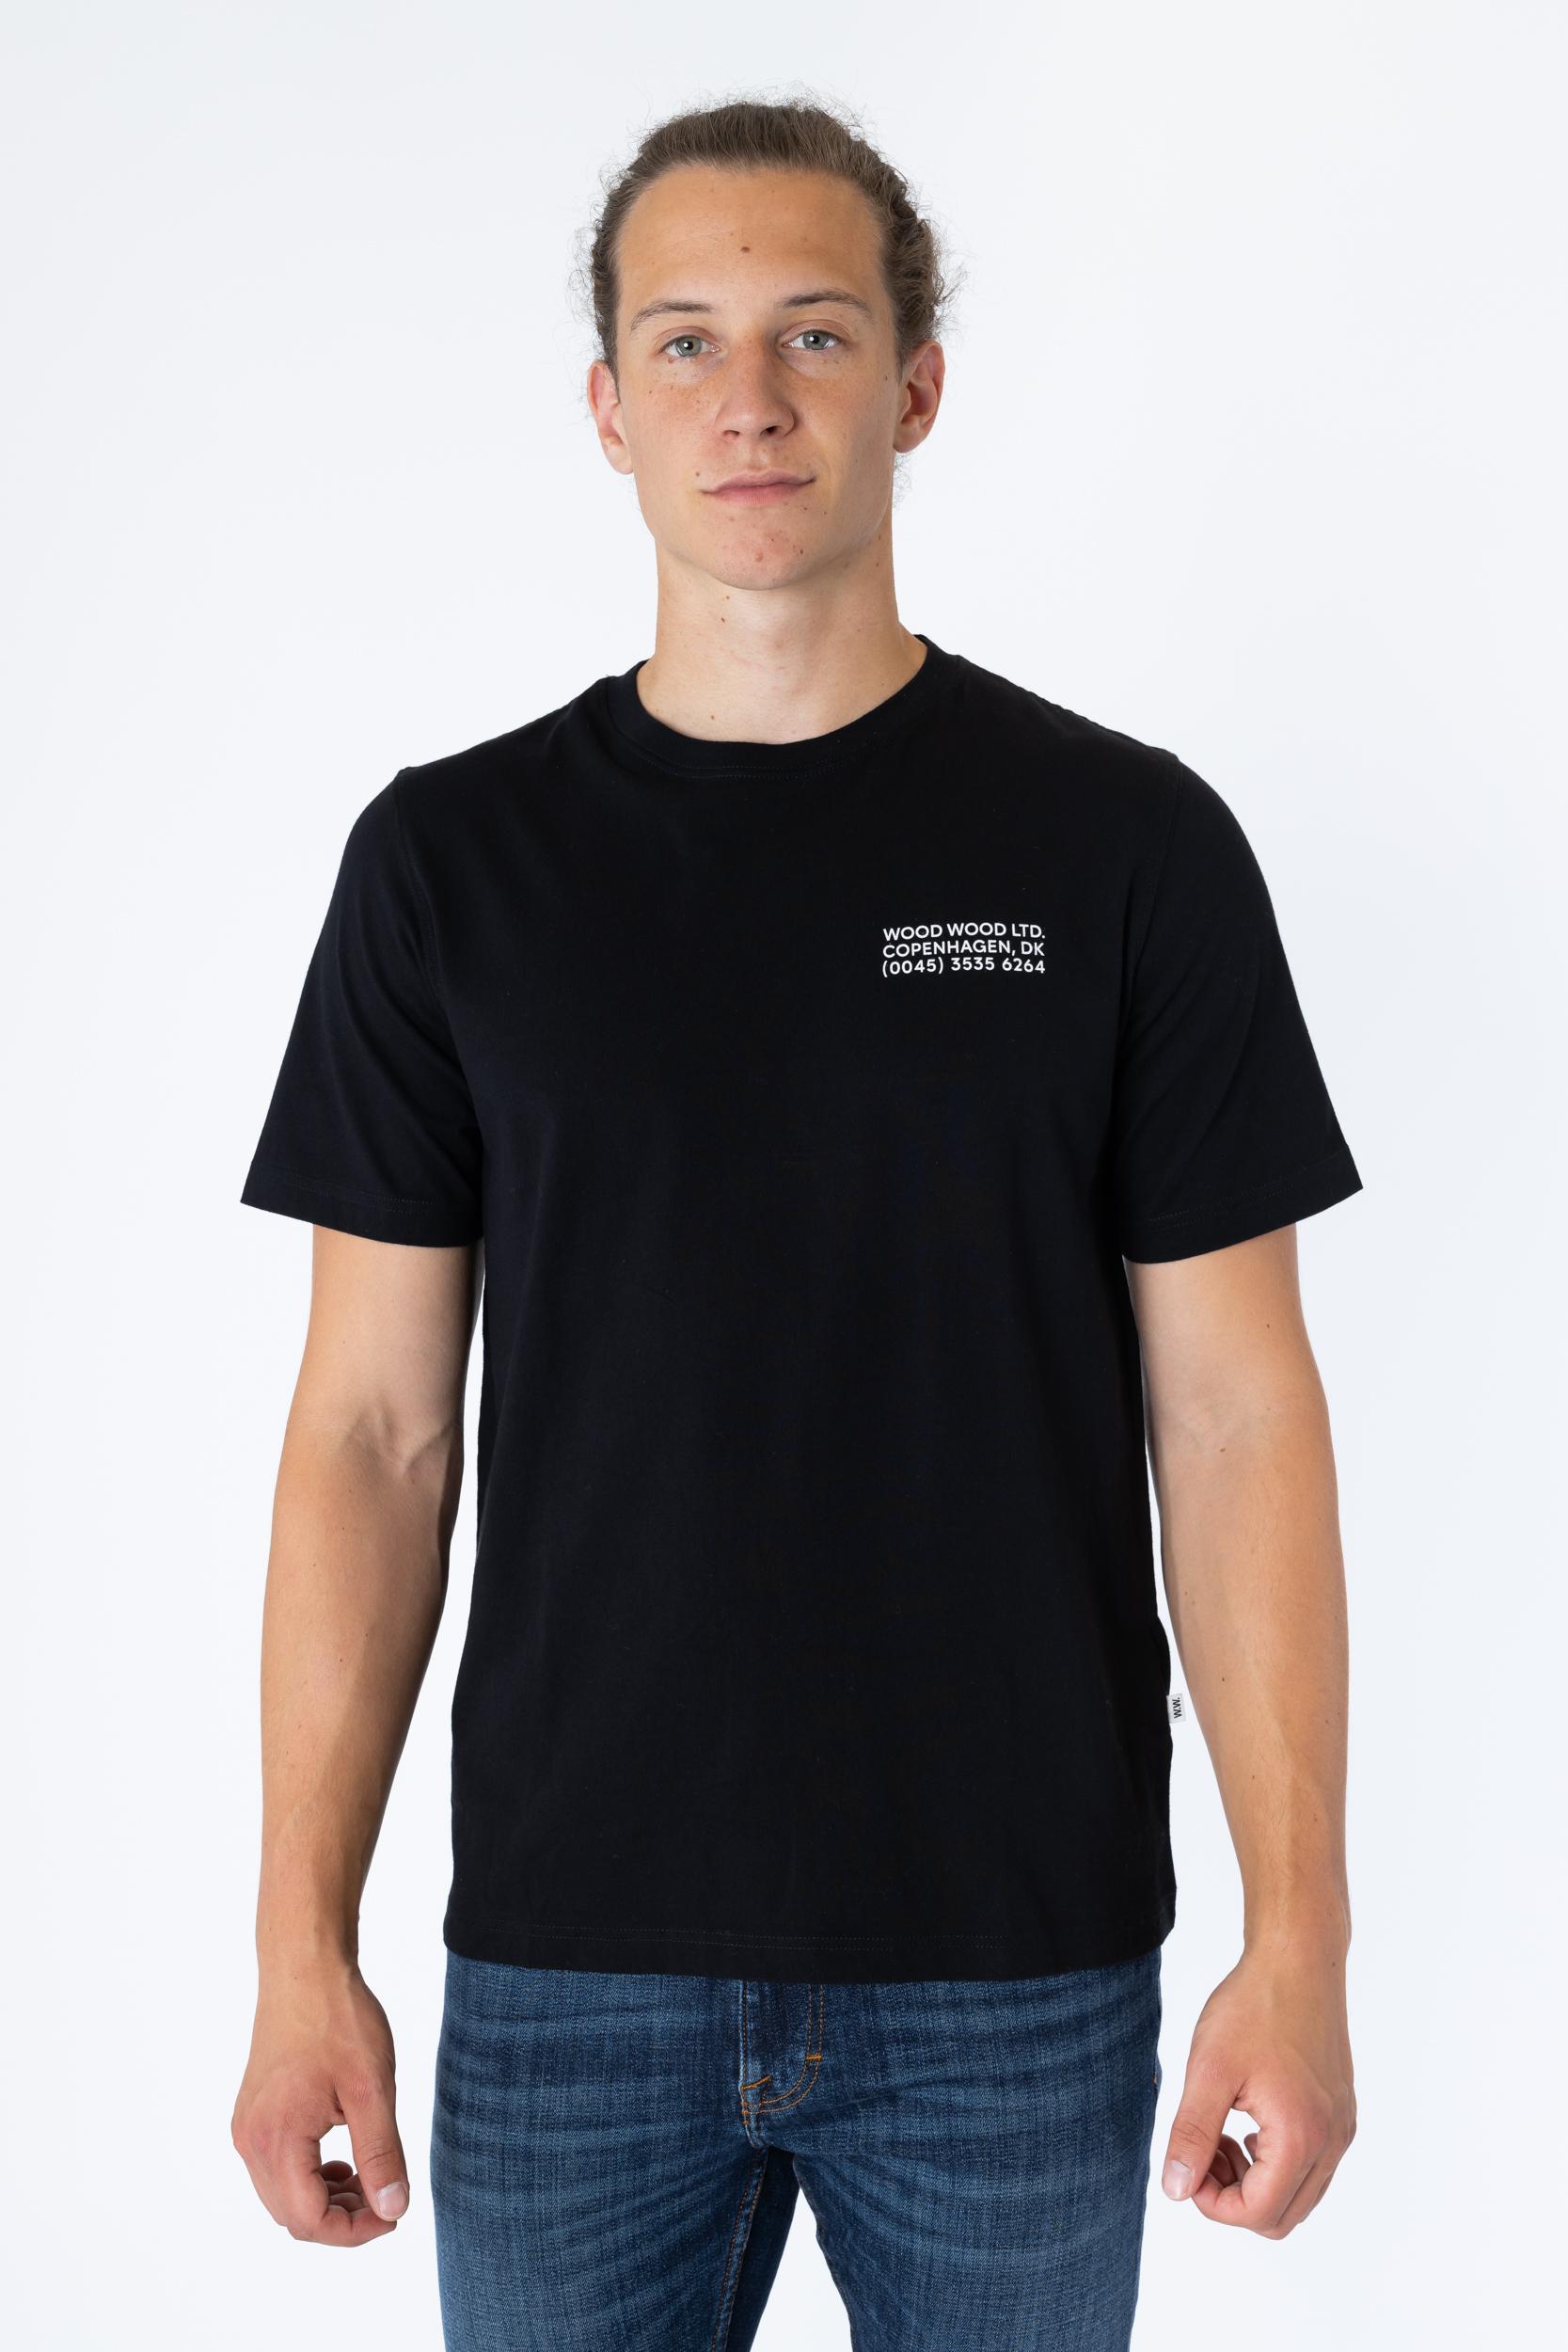 T-Shirt Sami info